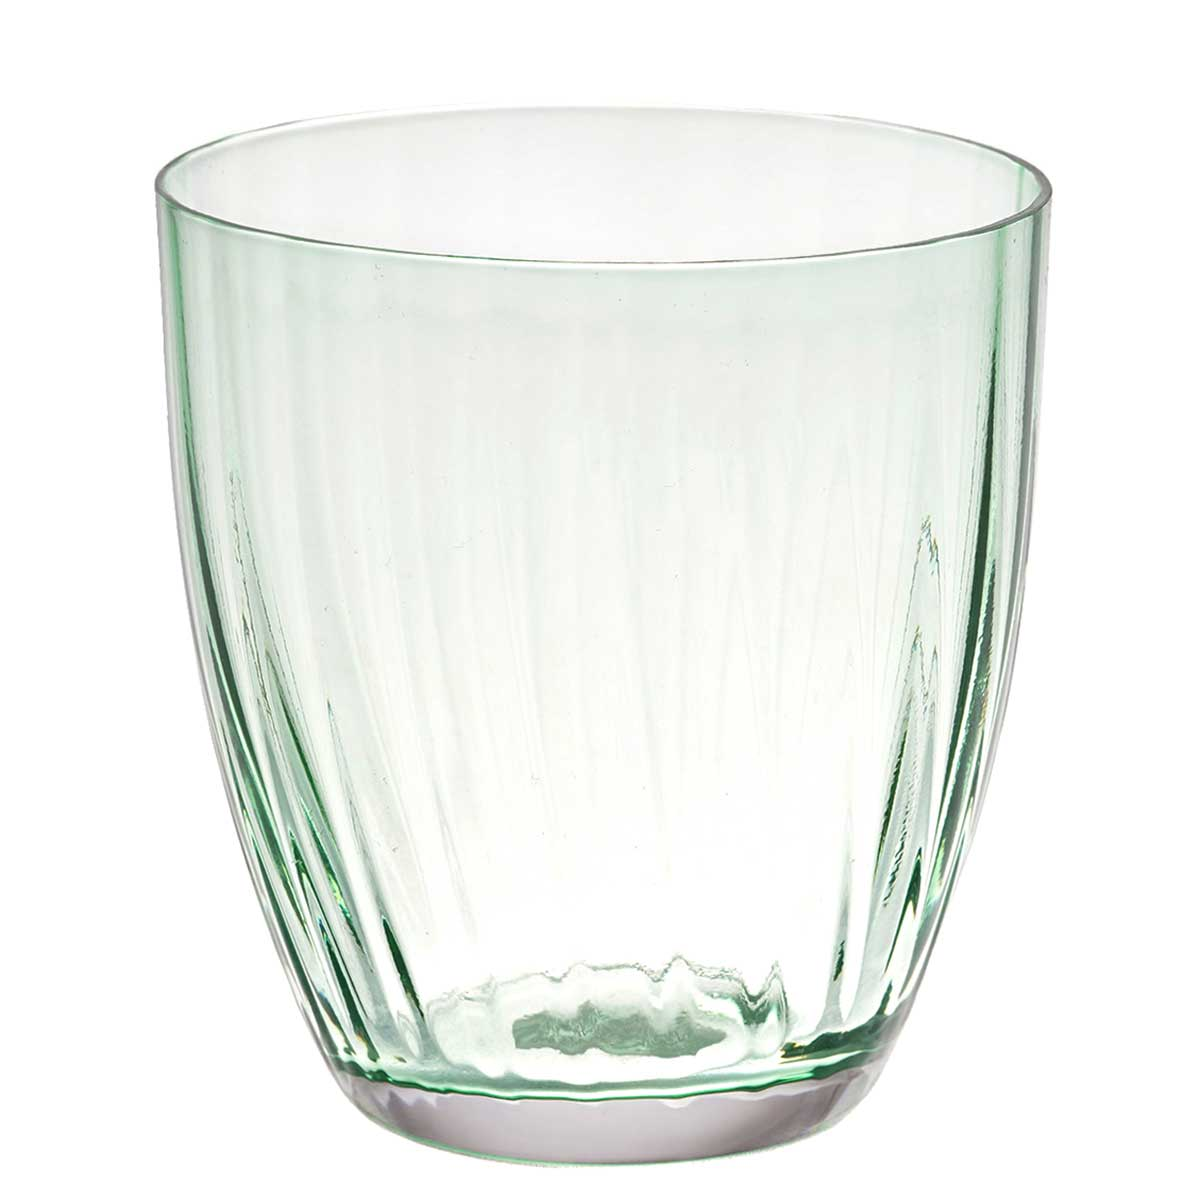 Набор стаканов для виски Арлекино Crystalex Bohemia 300 мл(6 шт) зеленые